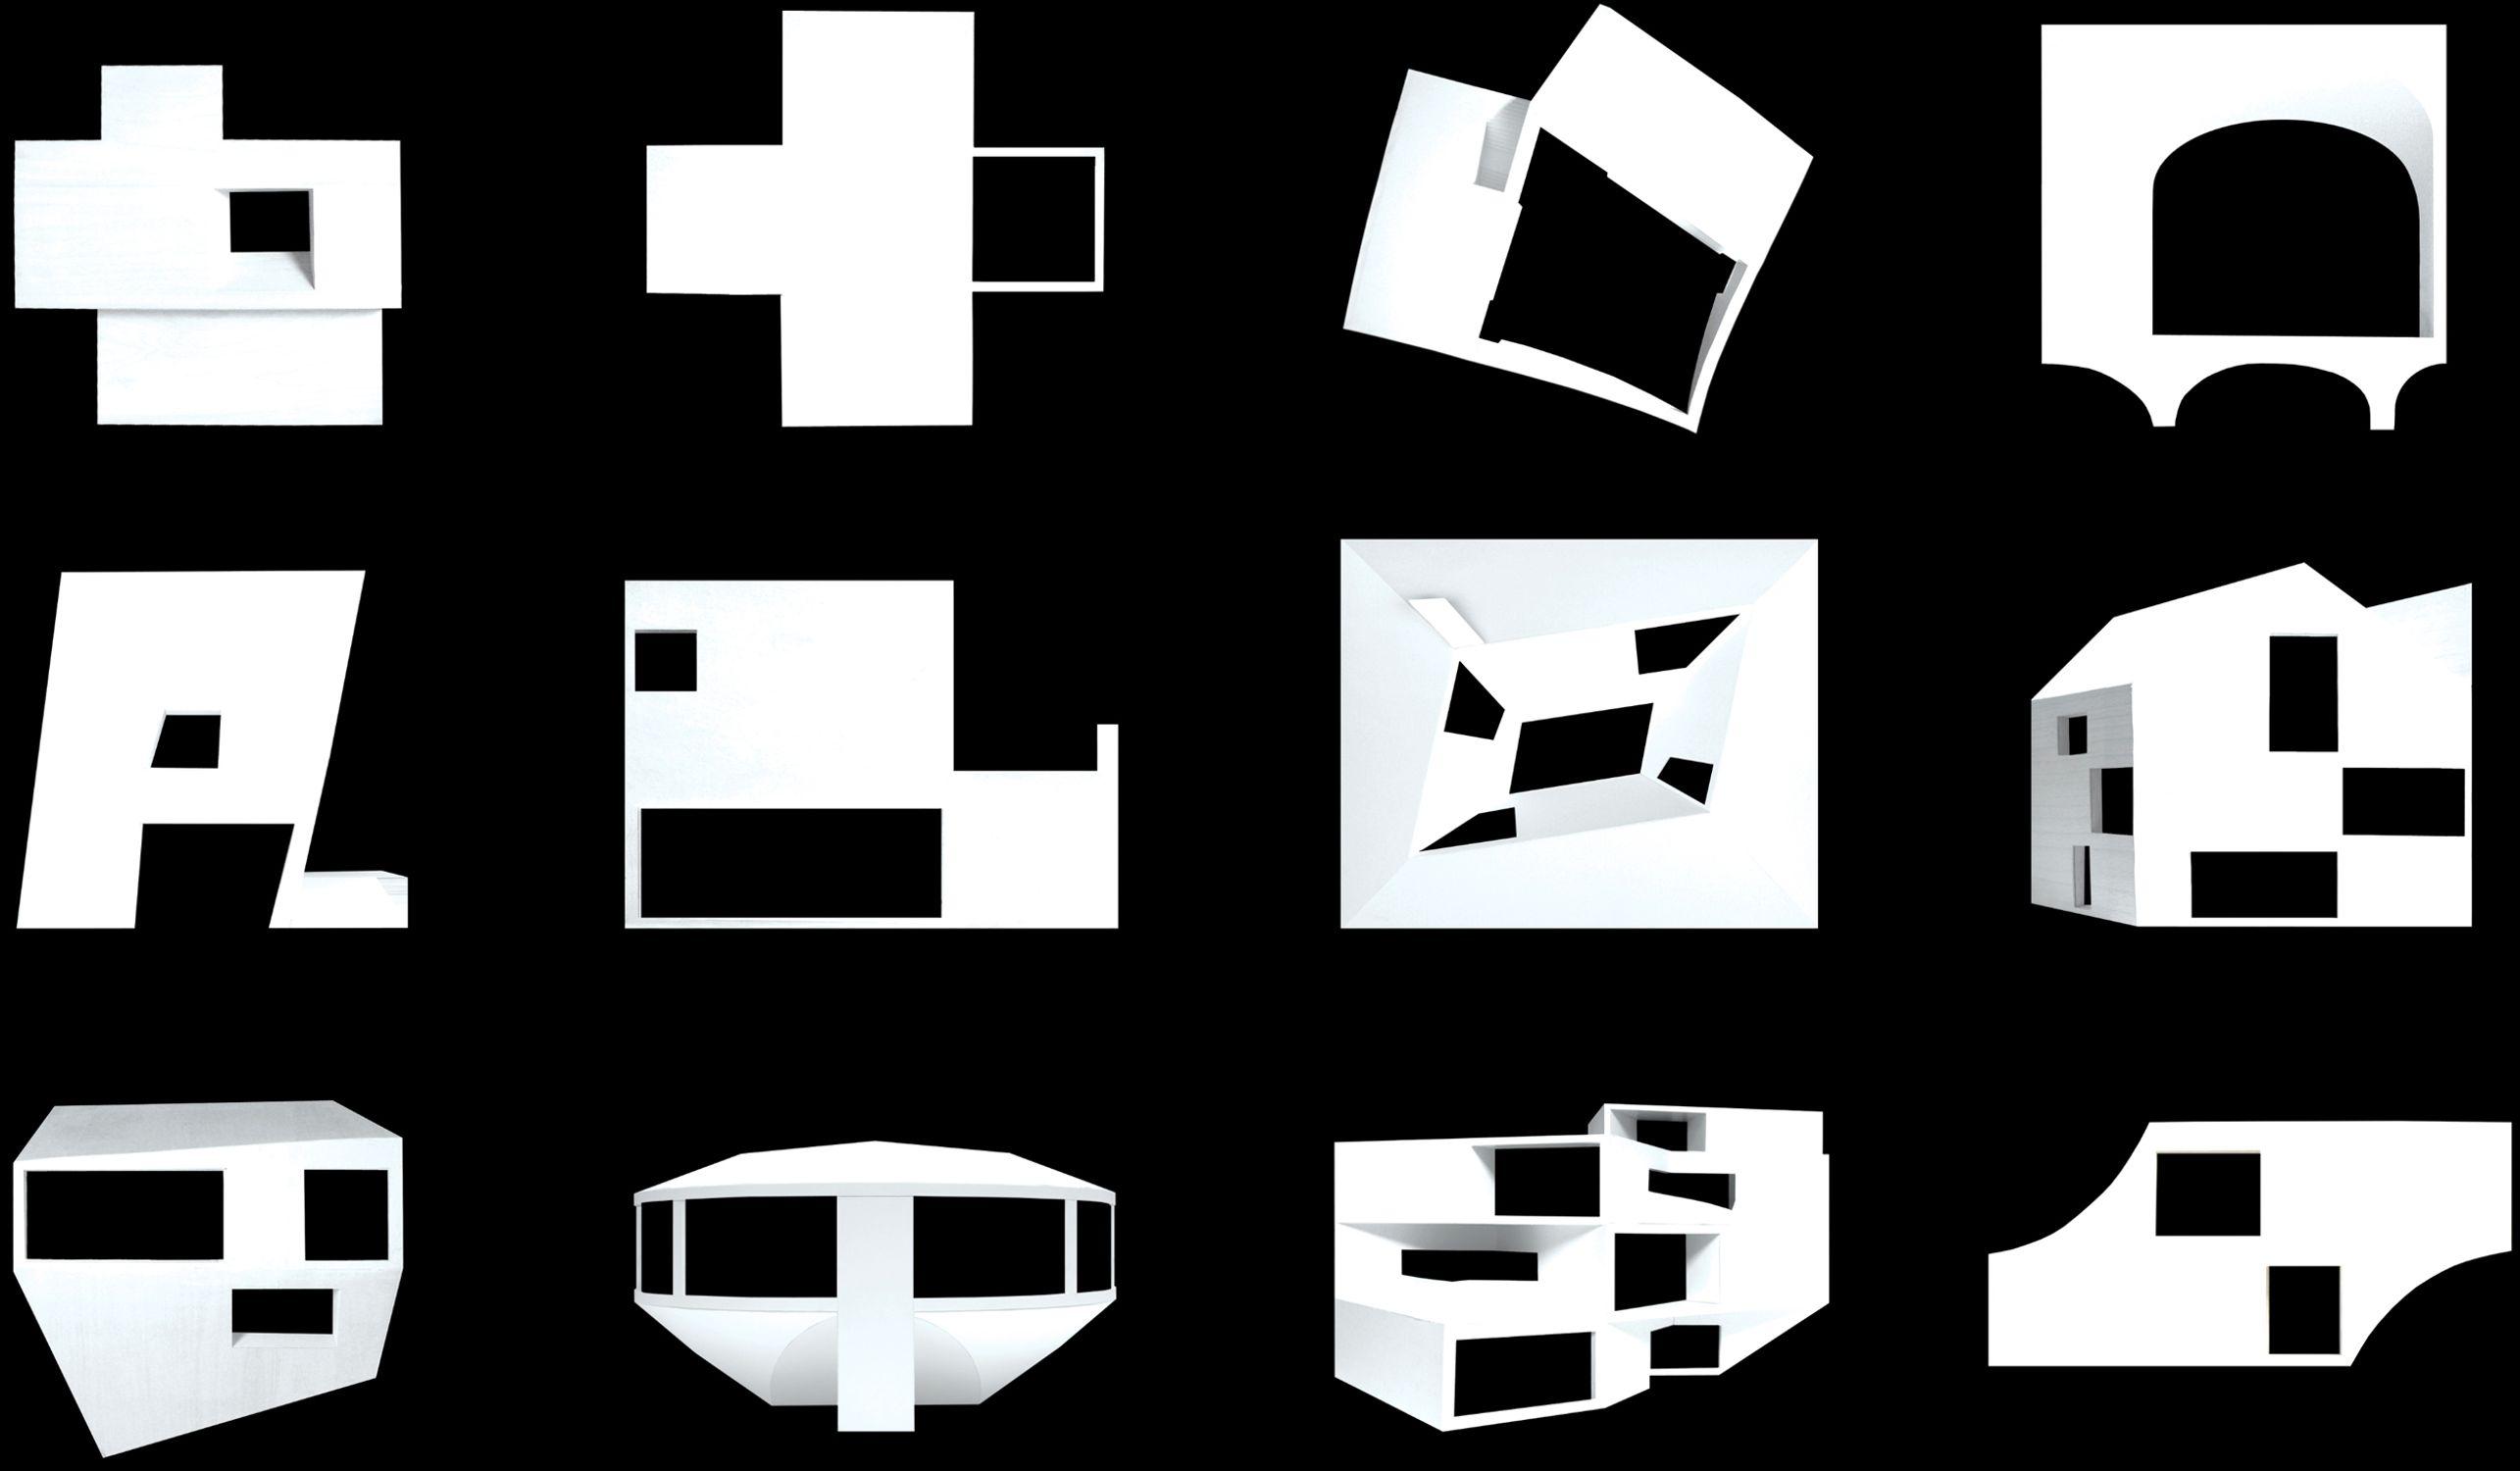 Philadelphia Contemporary Announces Johnston Marklee as Design Architects